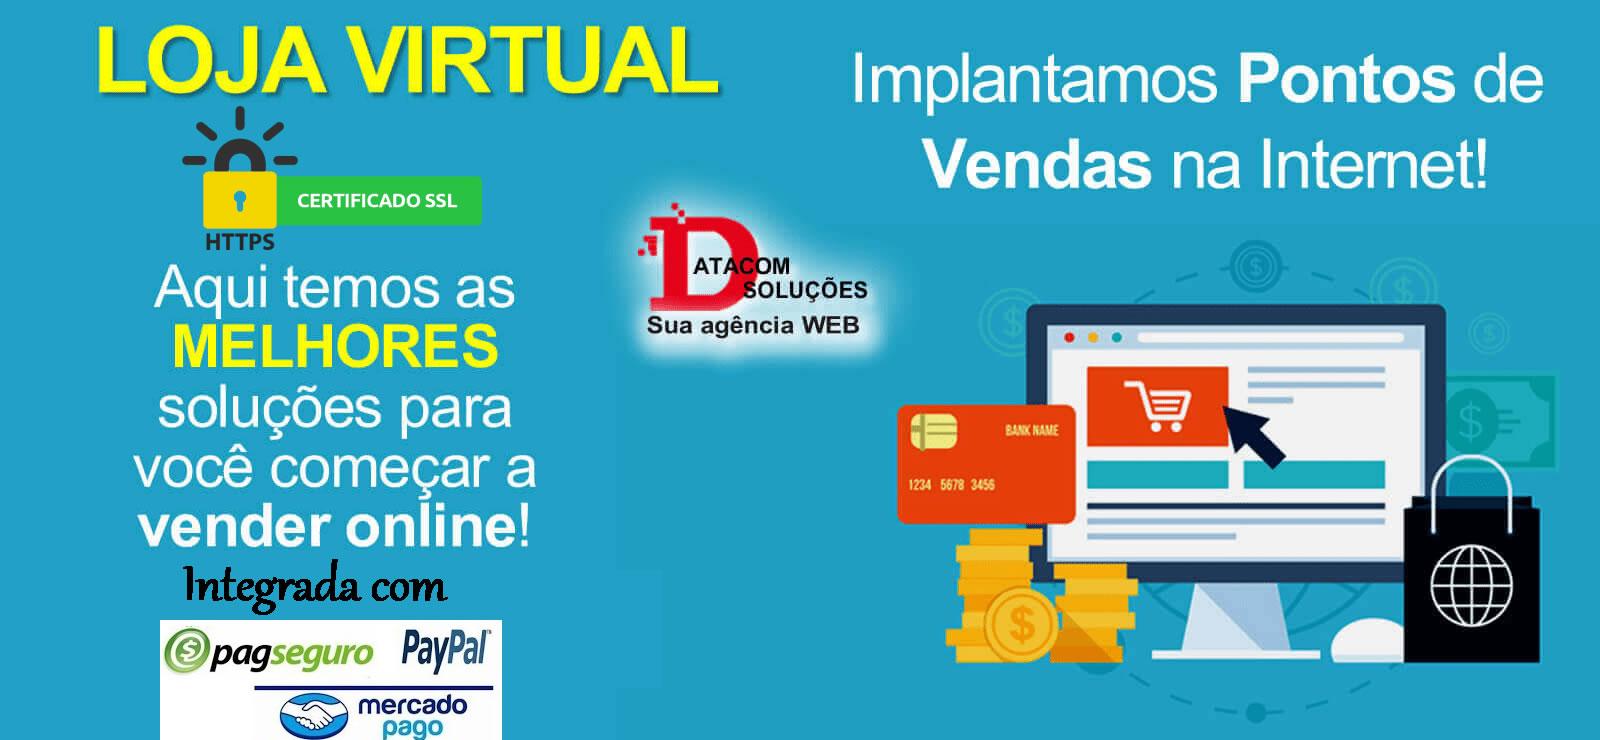 loja-virtual-datacomsolucoes